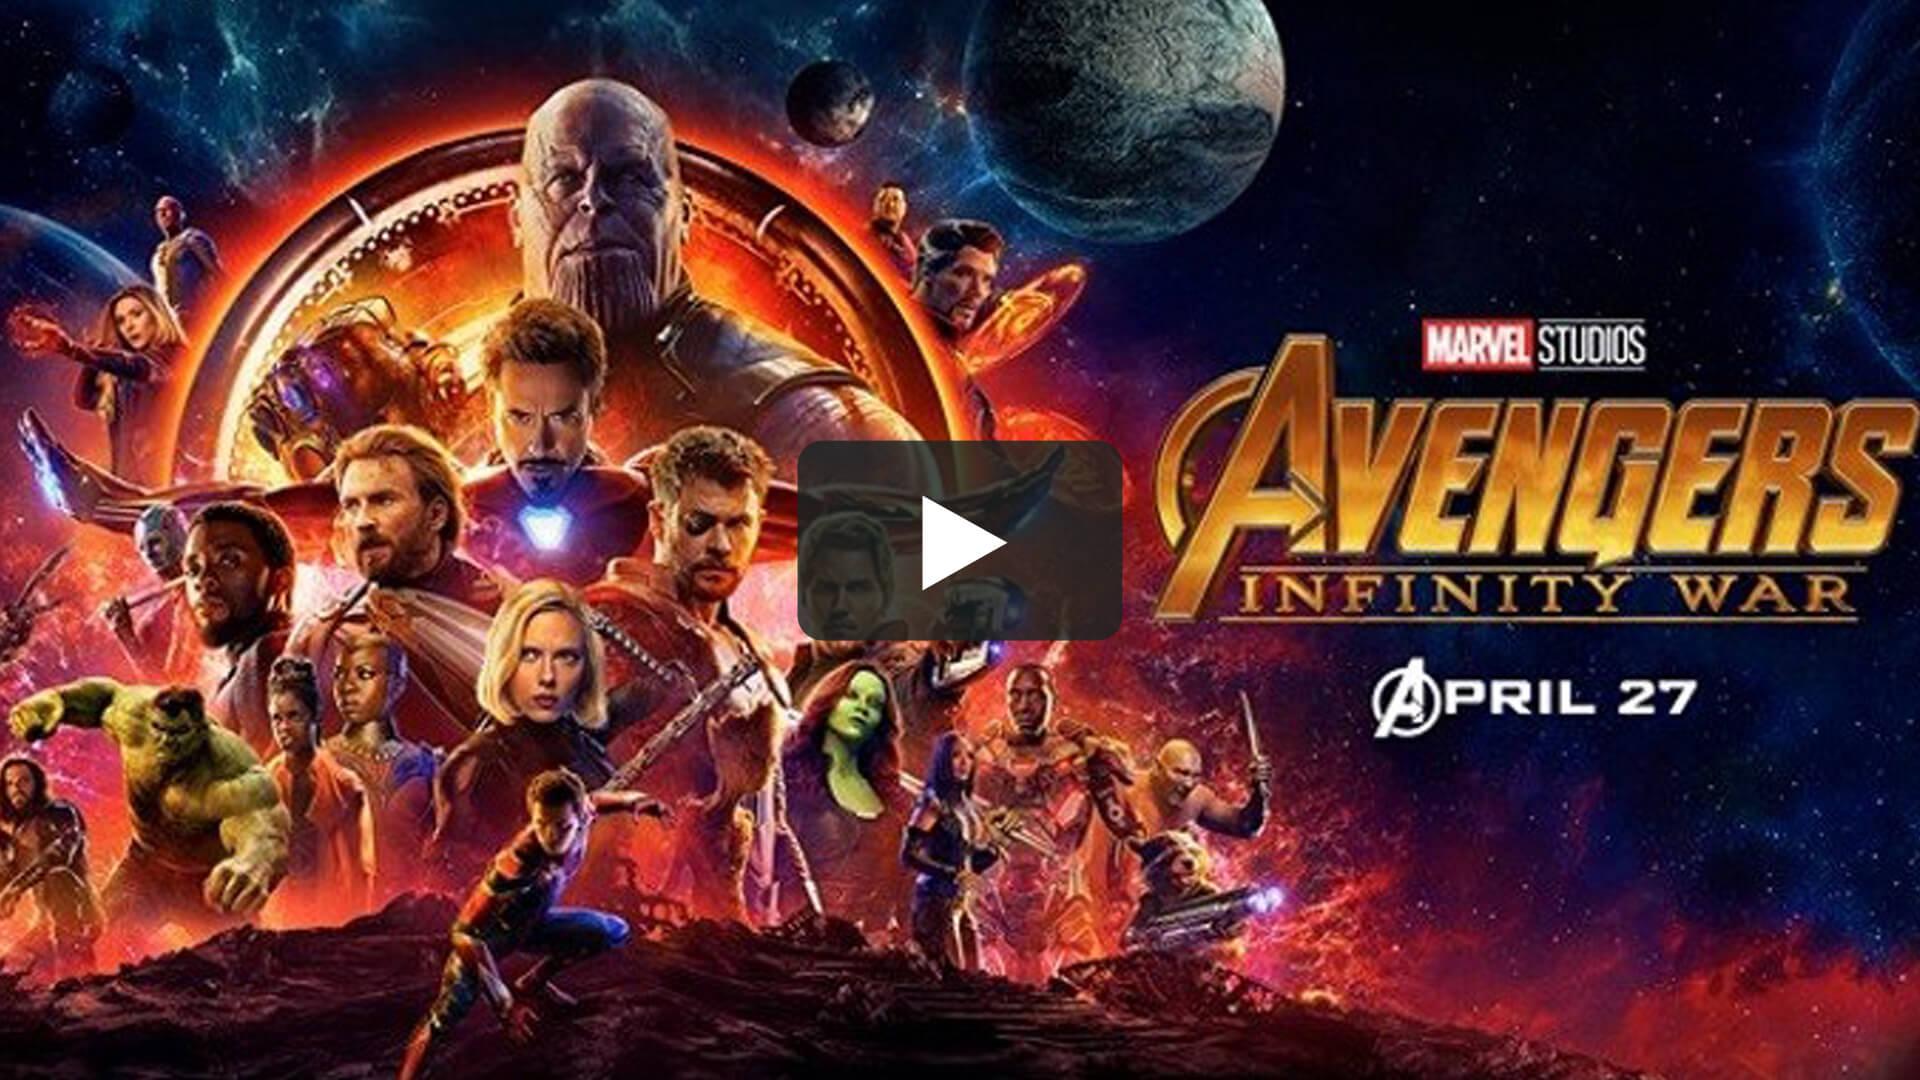 Avengers: Infinity War - 復仇者聯盟3:無限戰爭